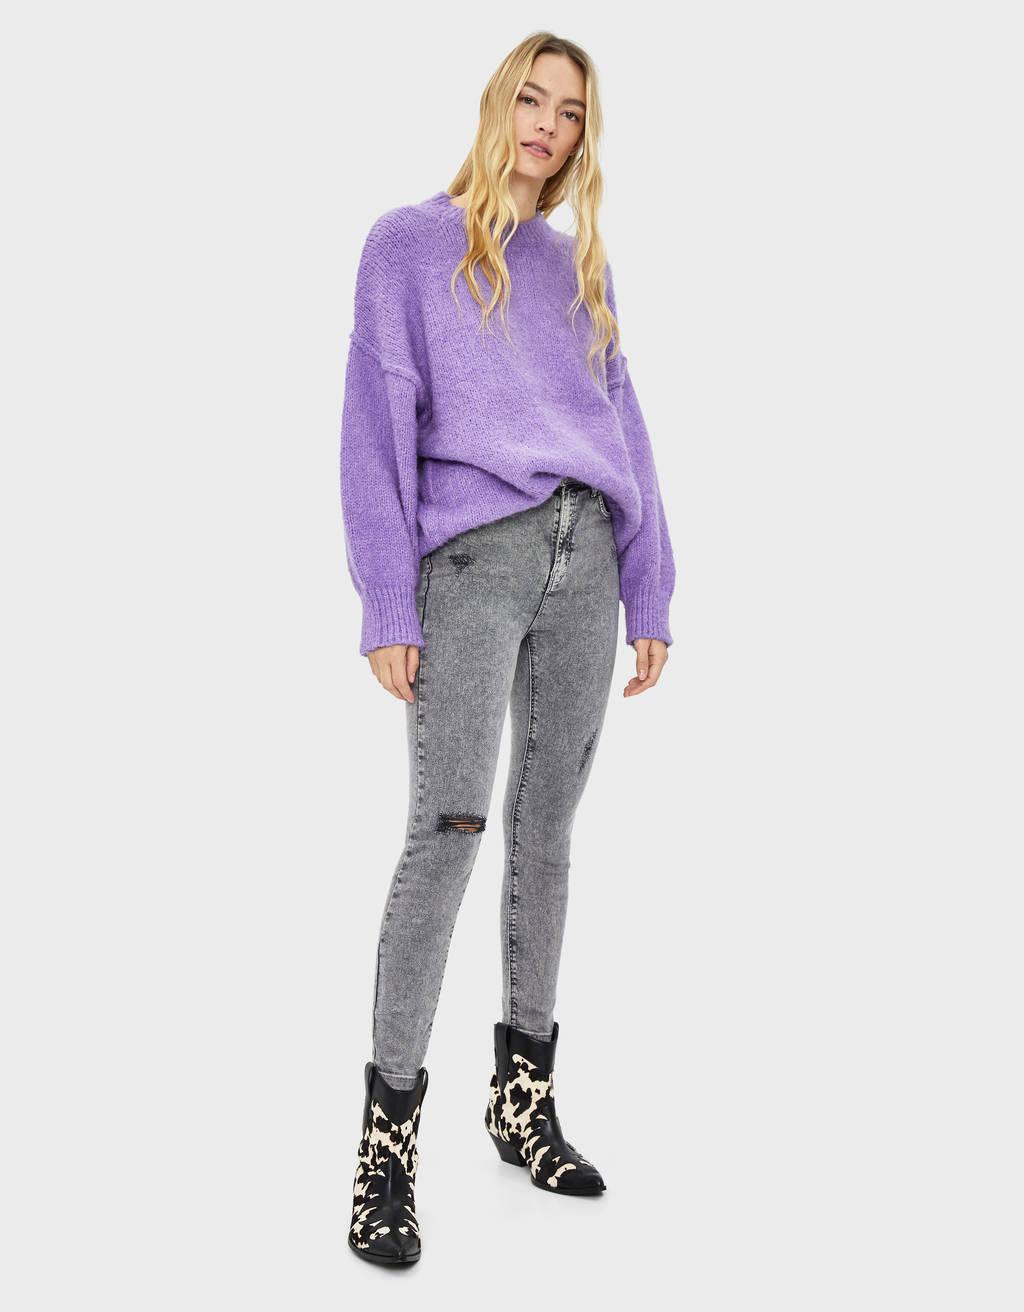 Ripped high waist jeans